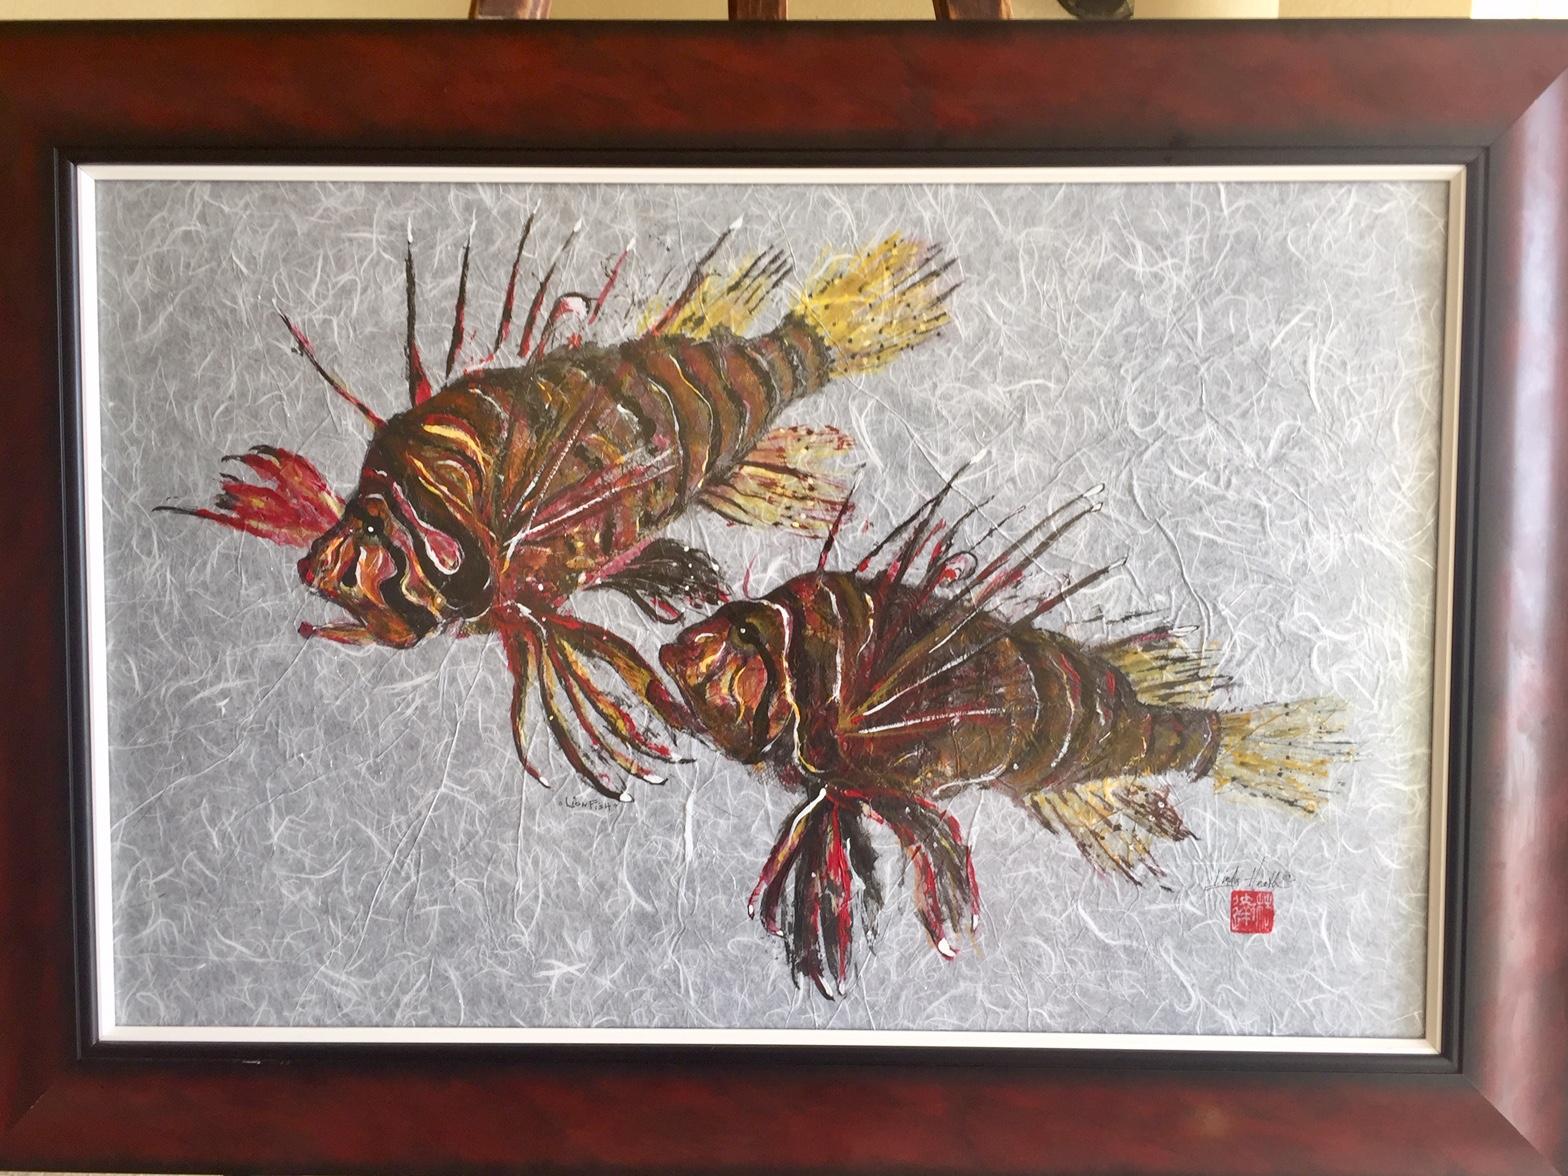 Original - Lionfish